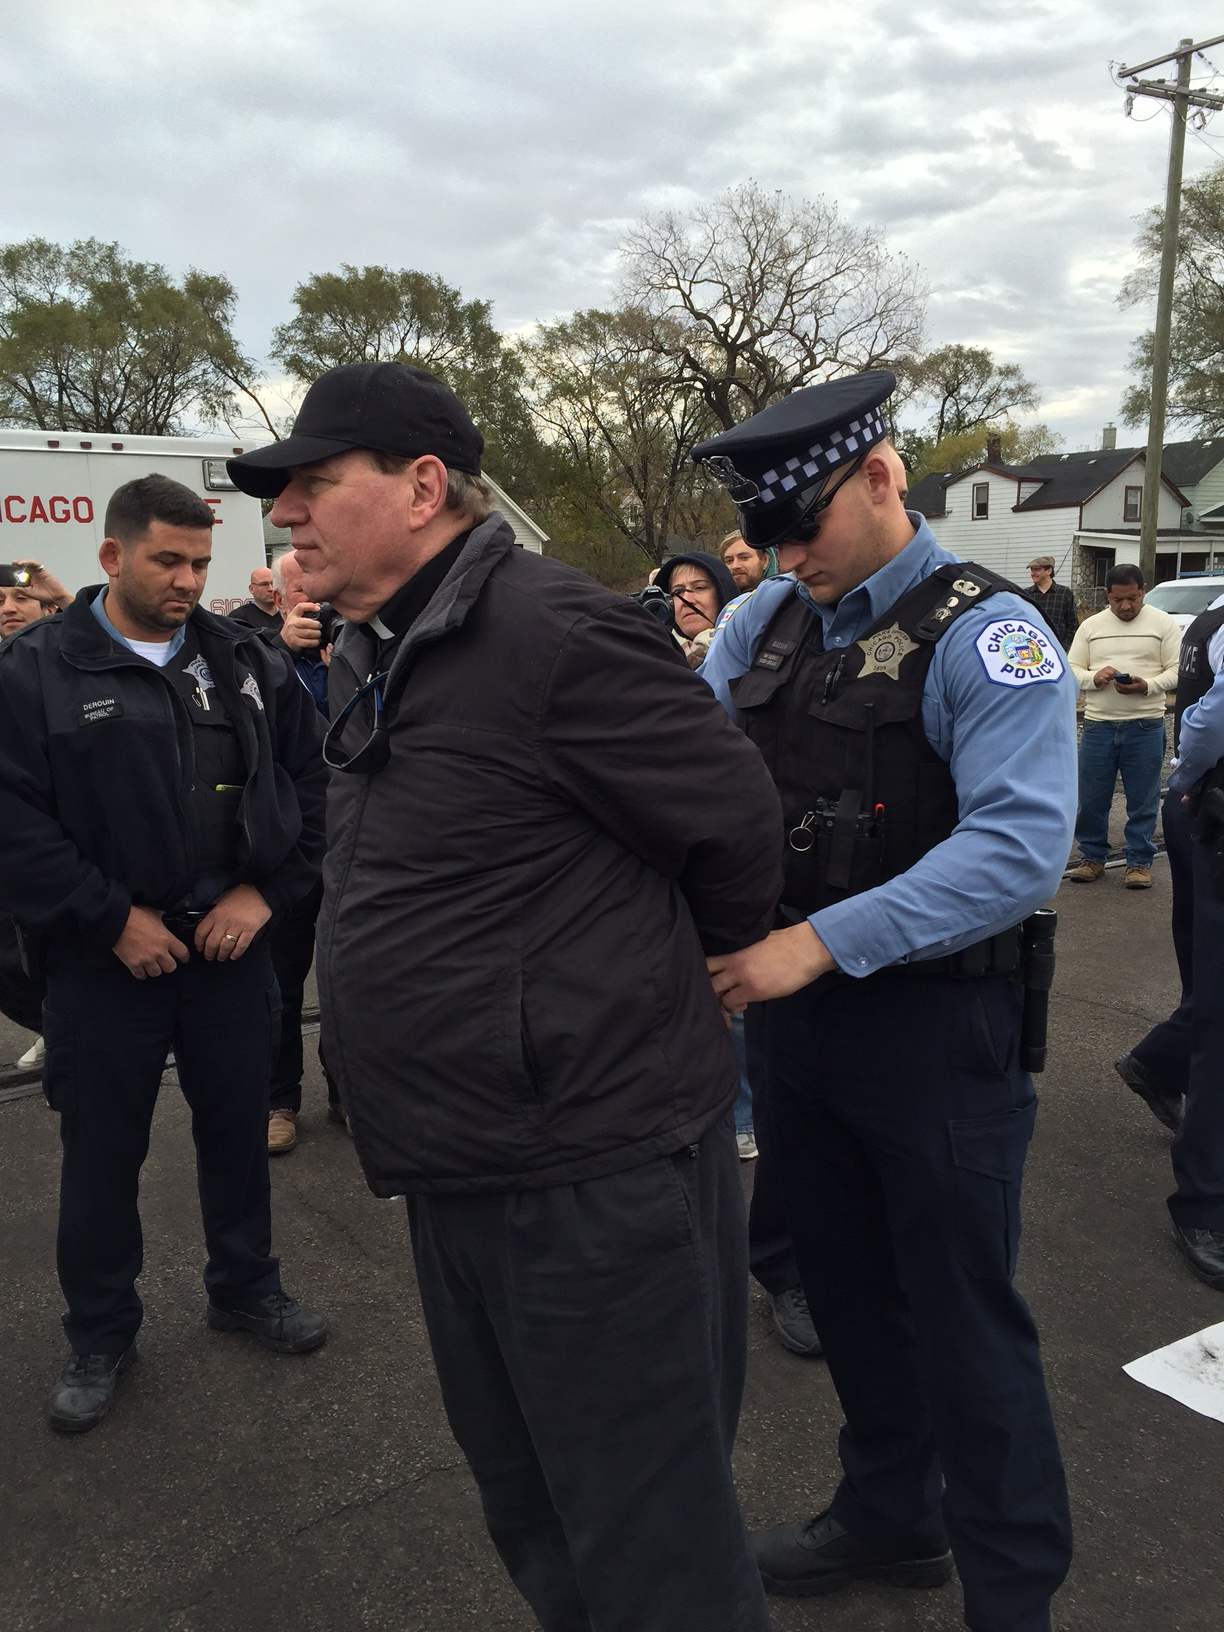 Police arrest Rev. Jim Galuhn of the East Side United Methodist Church.